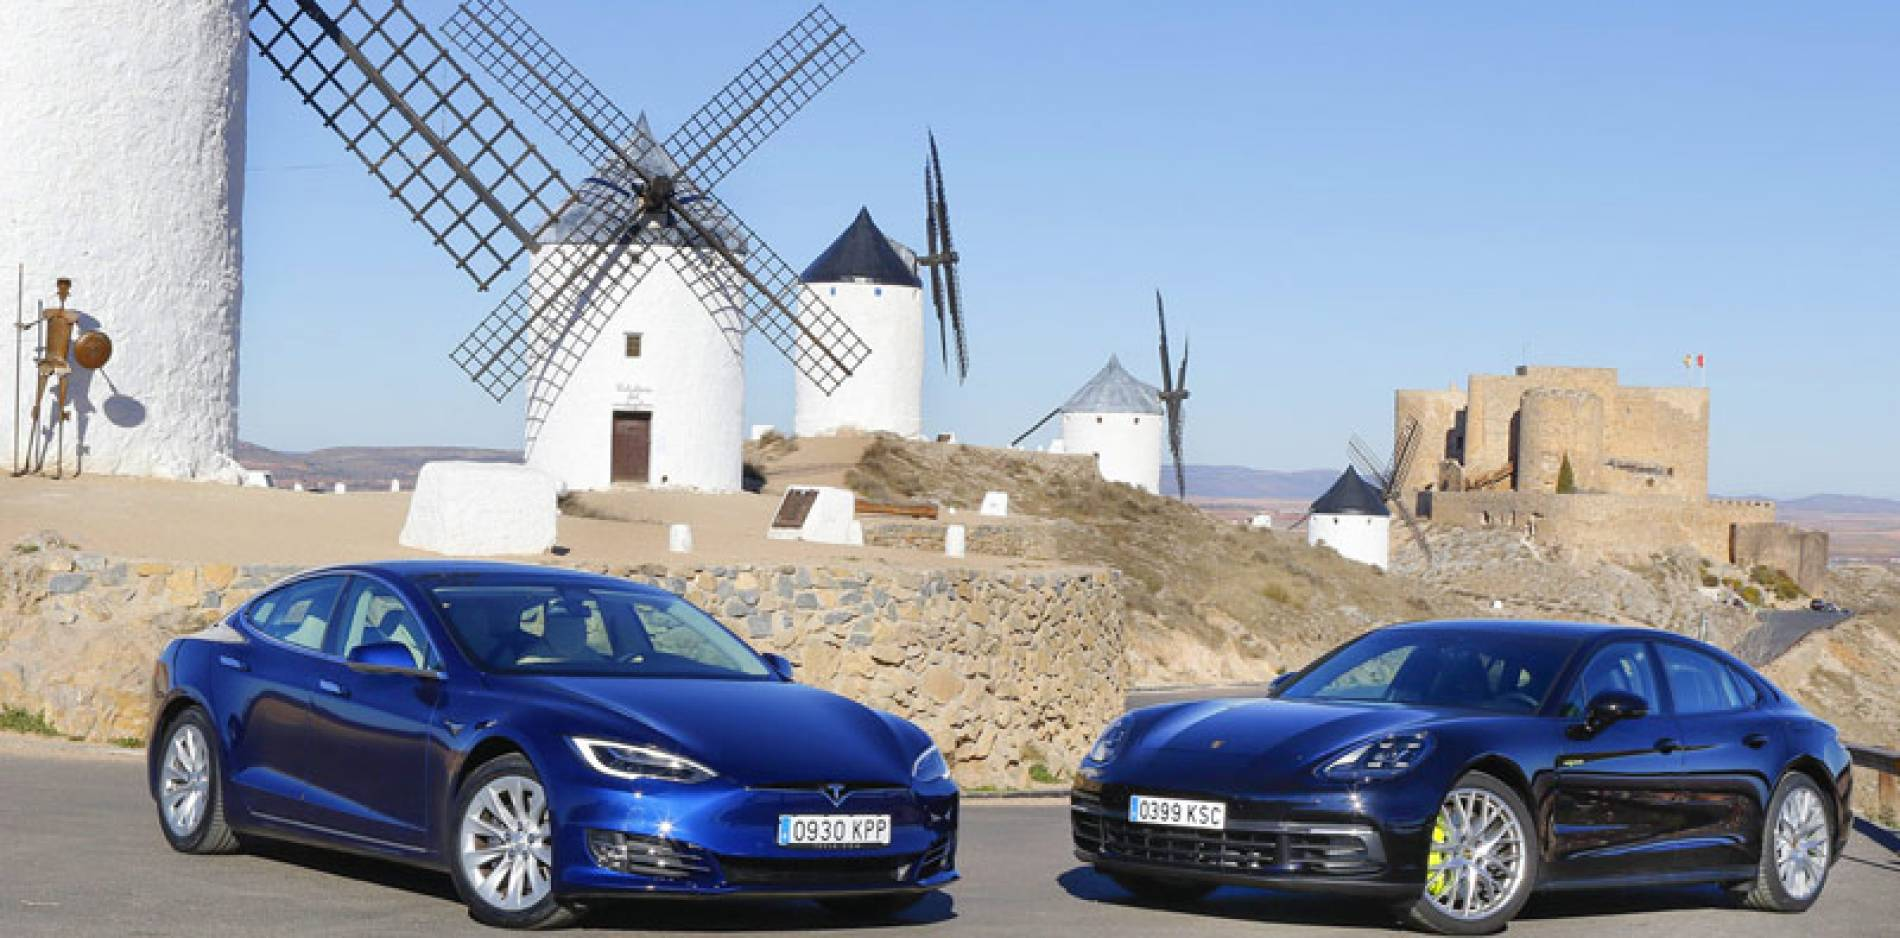 Comparativa ecológica: Tesla Model S 100D vs Porsche Panamera 4 E-Hybrid